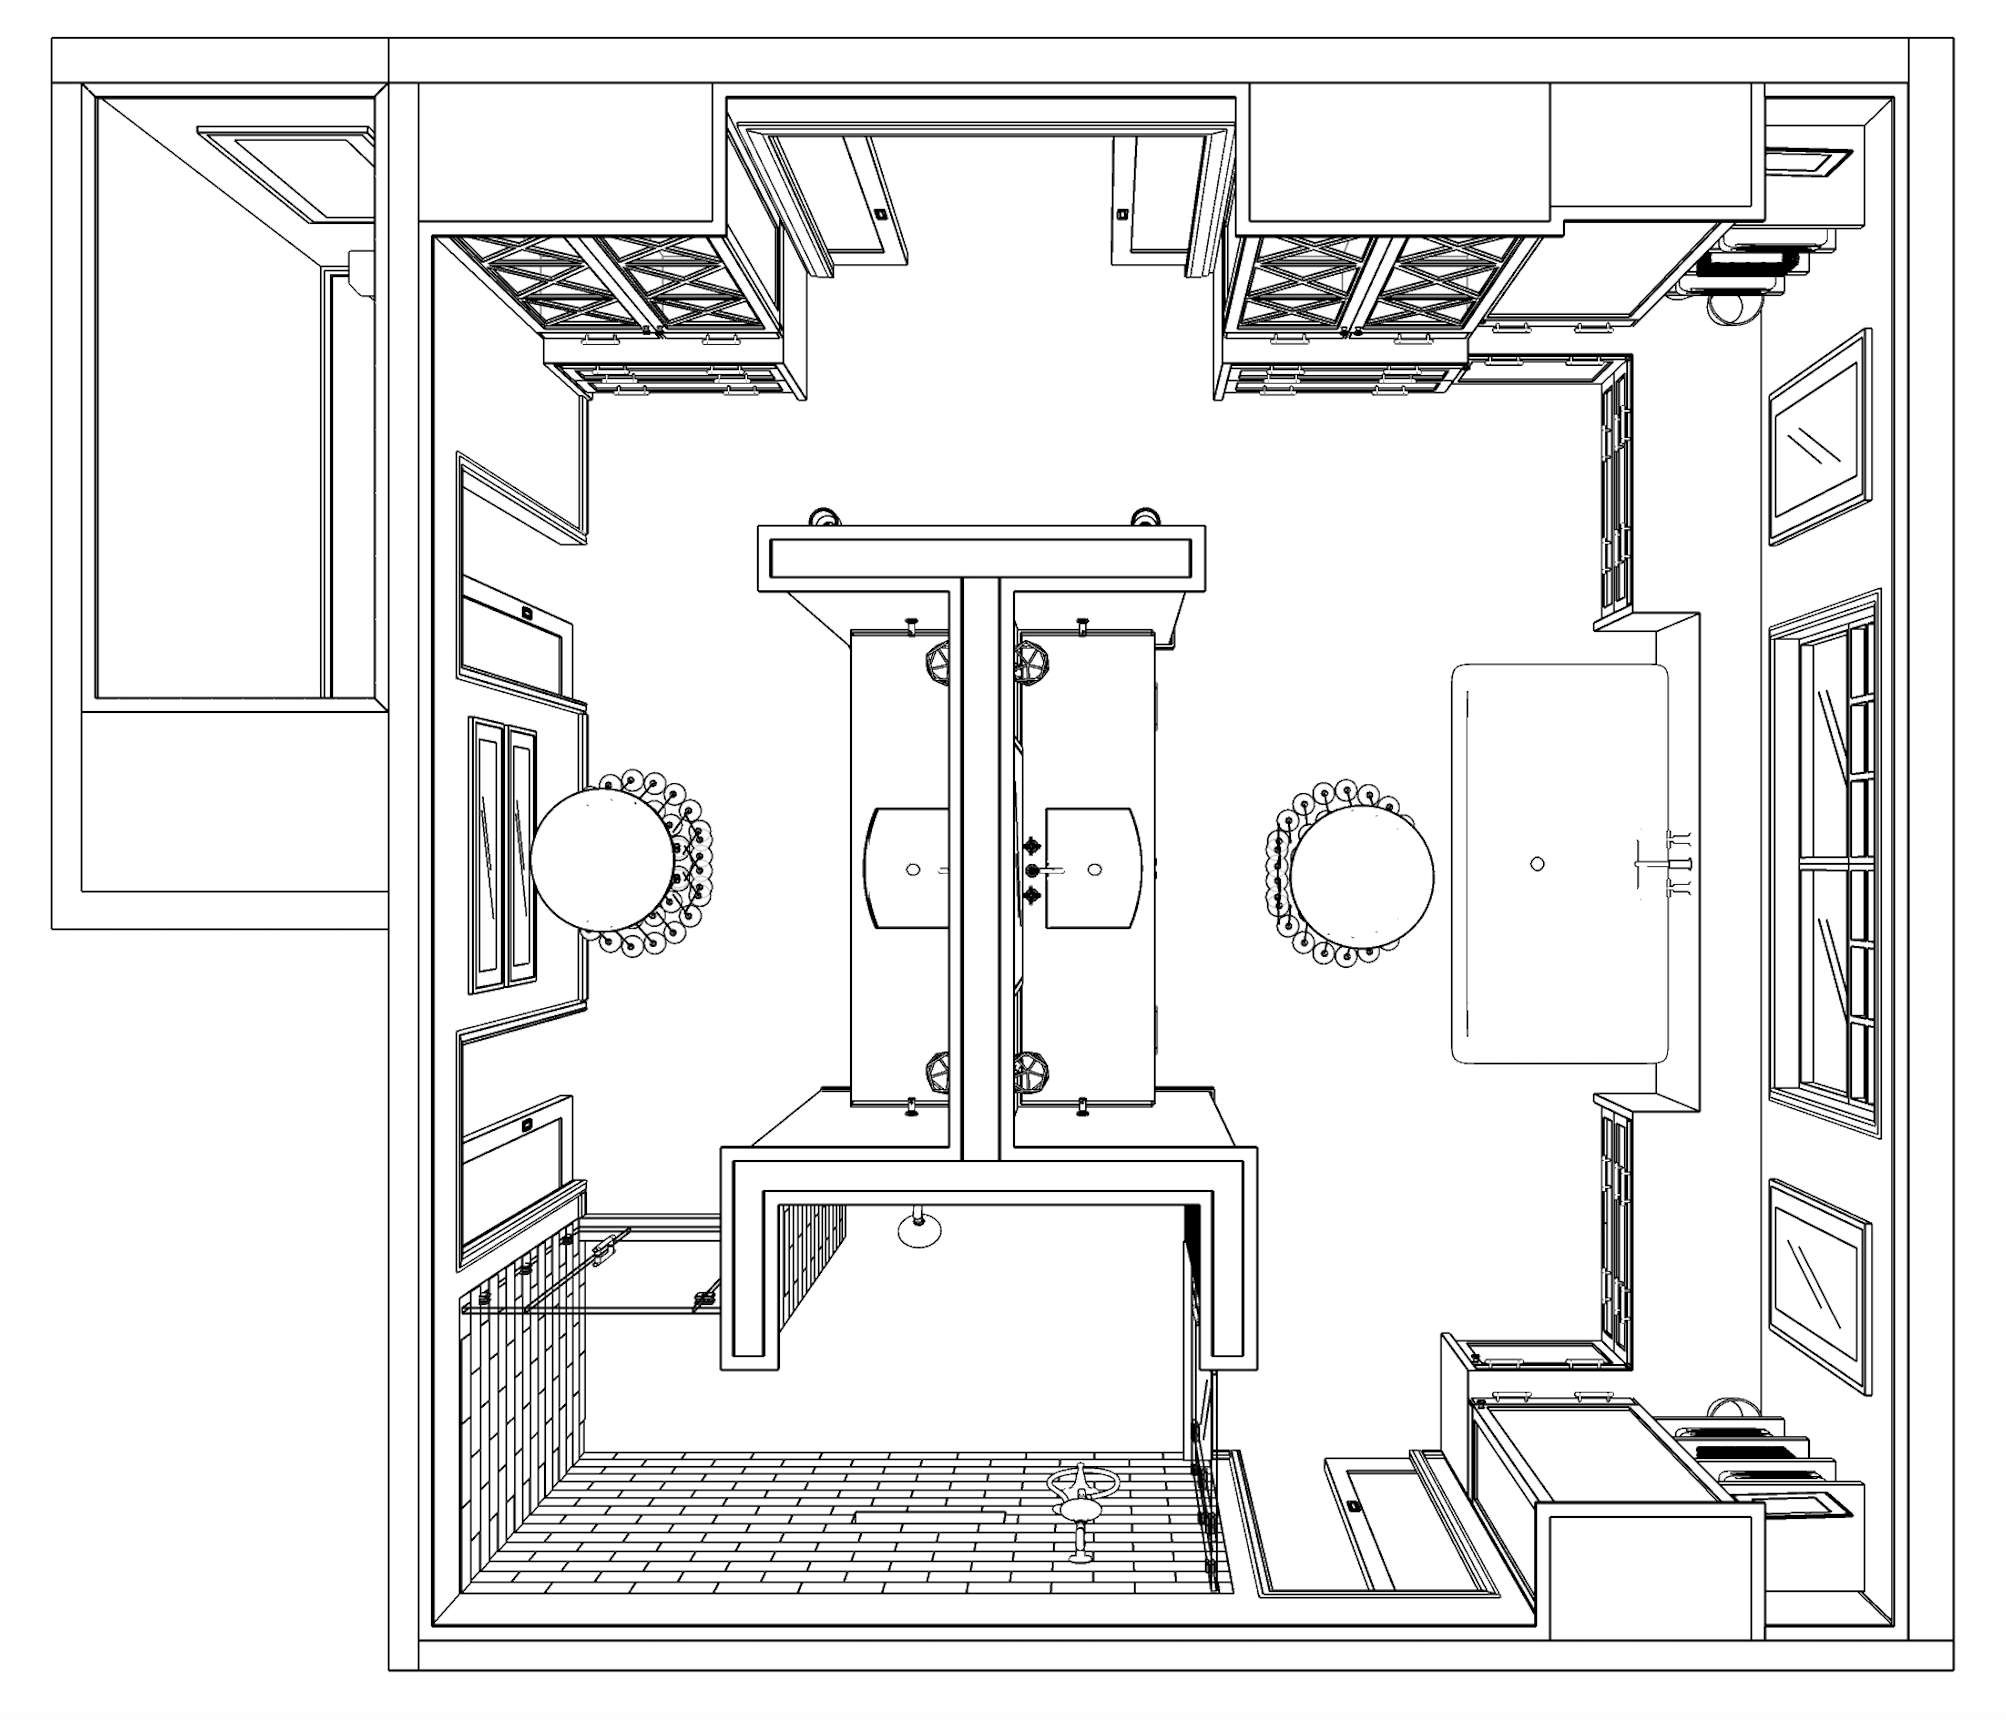 REVISED MASTER BATHROOM PERSEPCTIVE PLAN